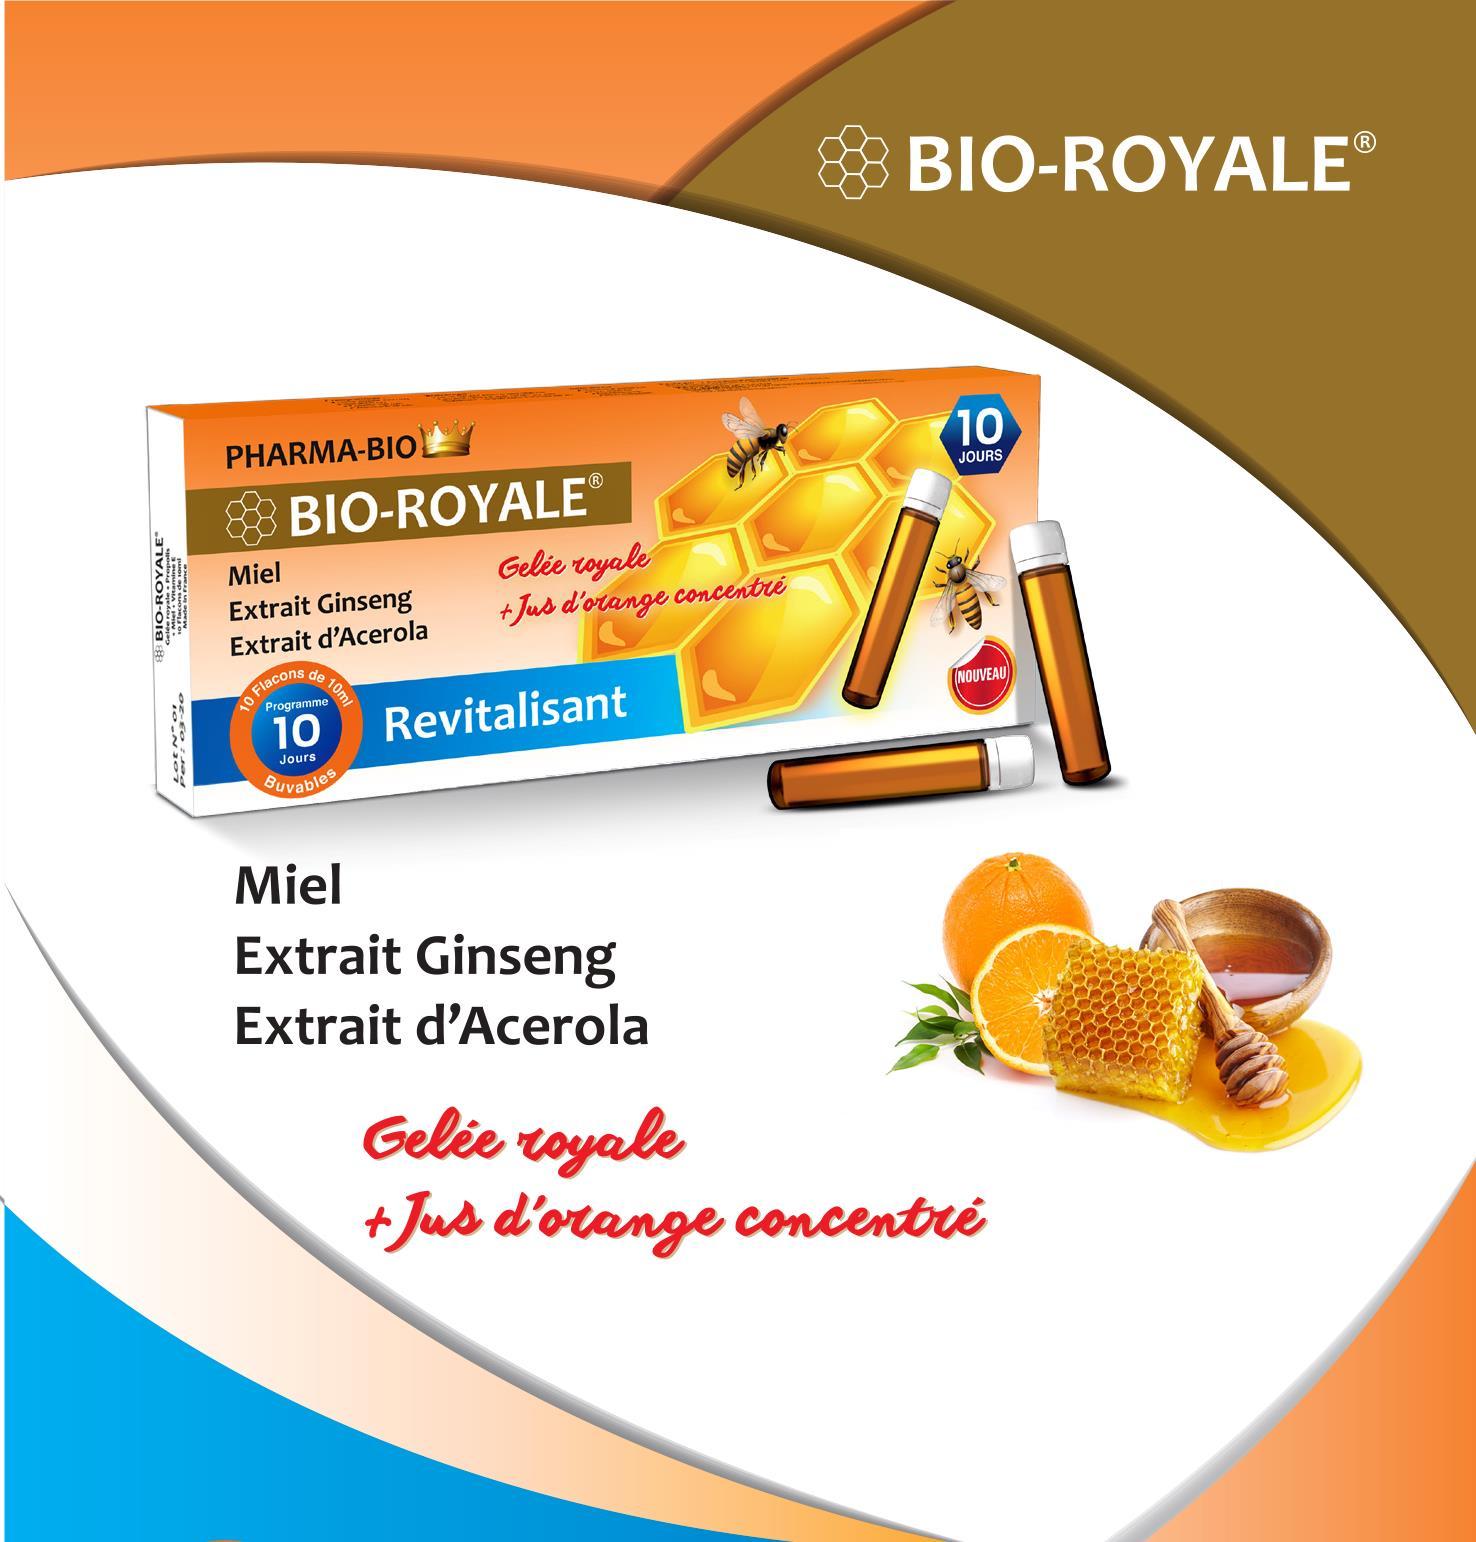 BIO-ROYALE Gelée royale + propolis